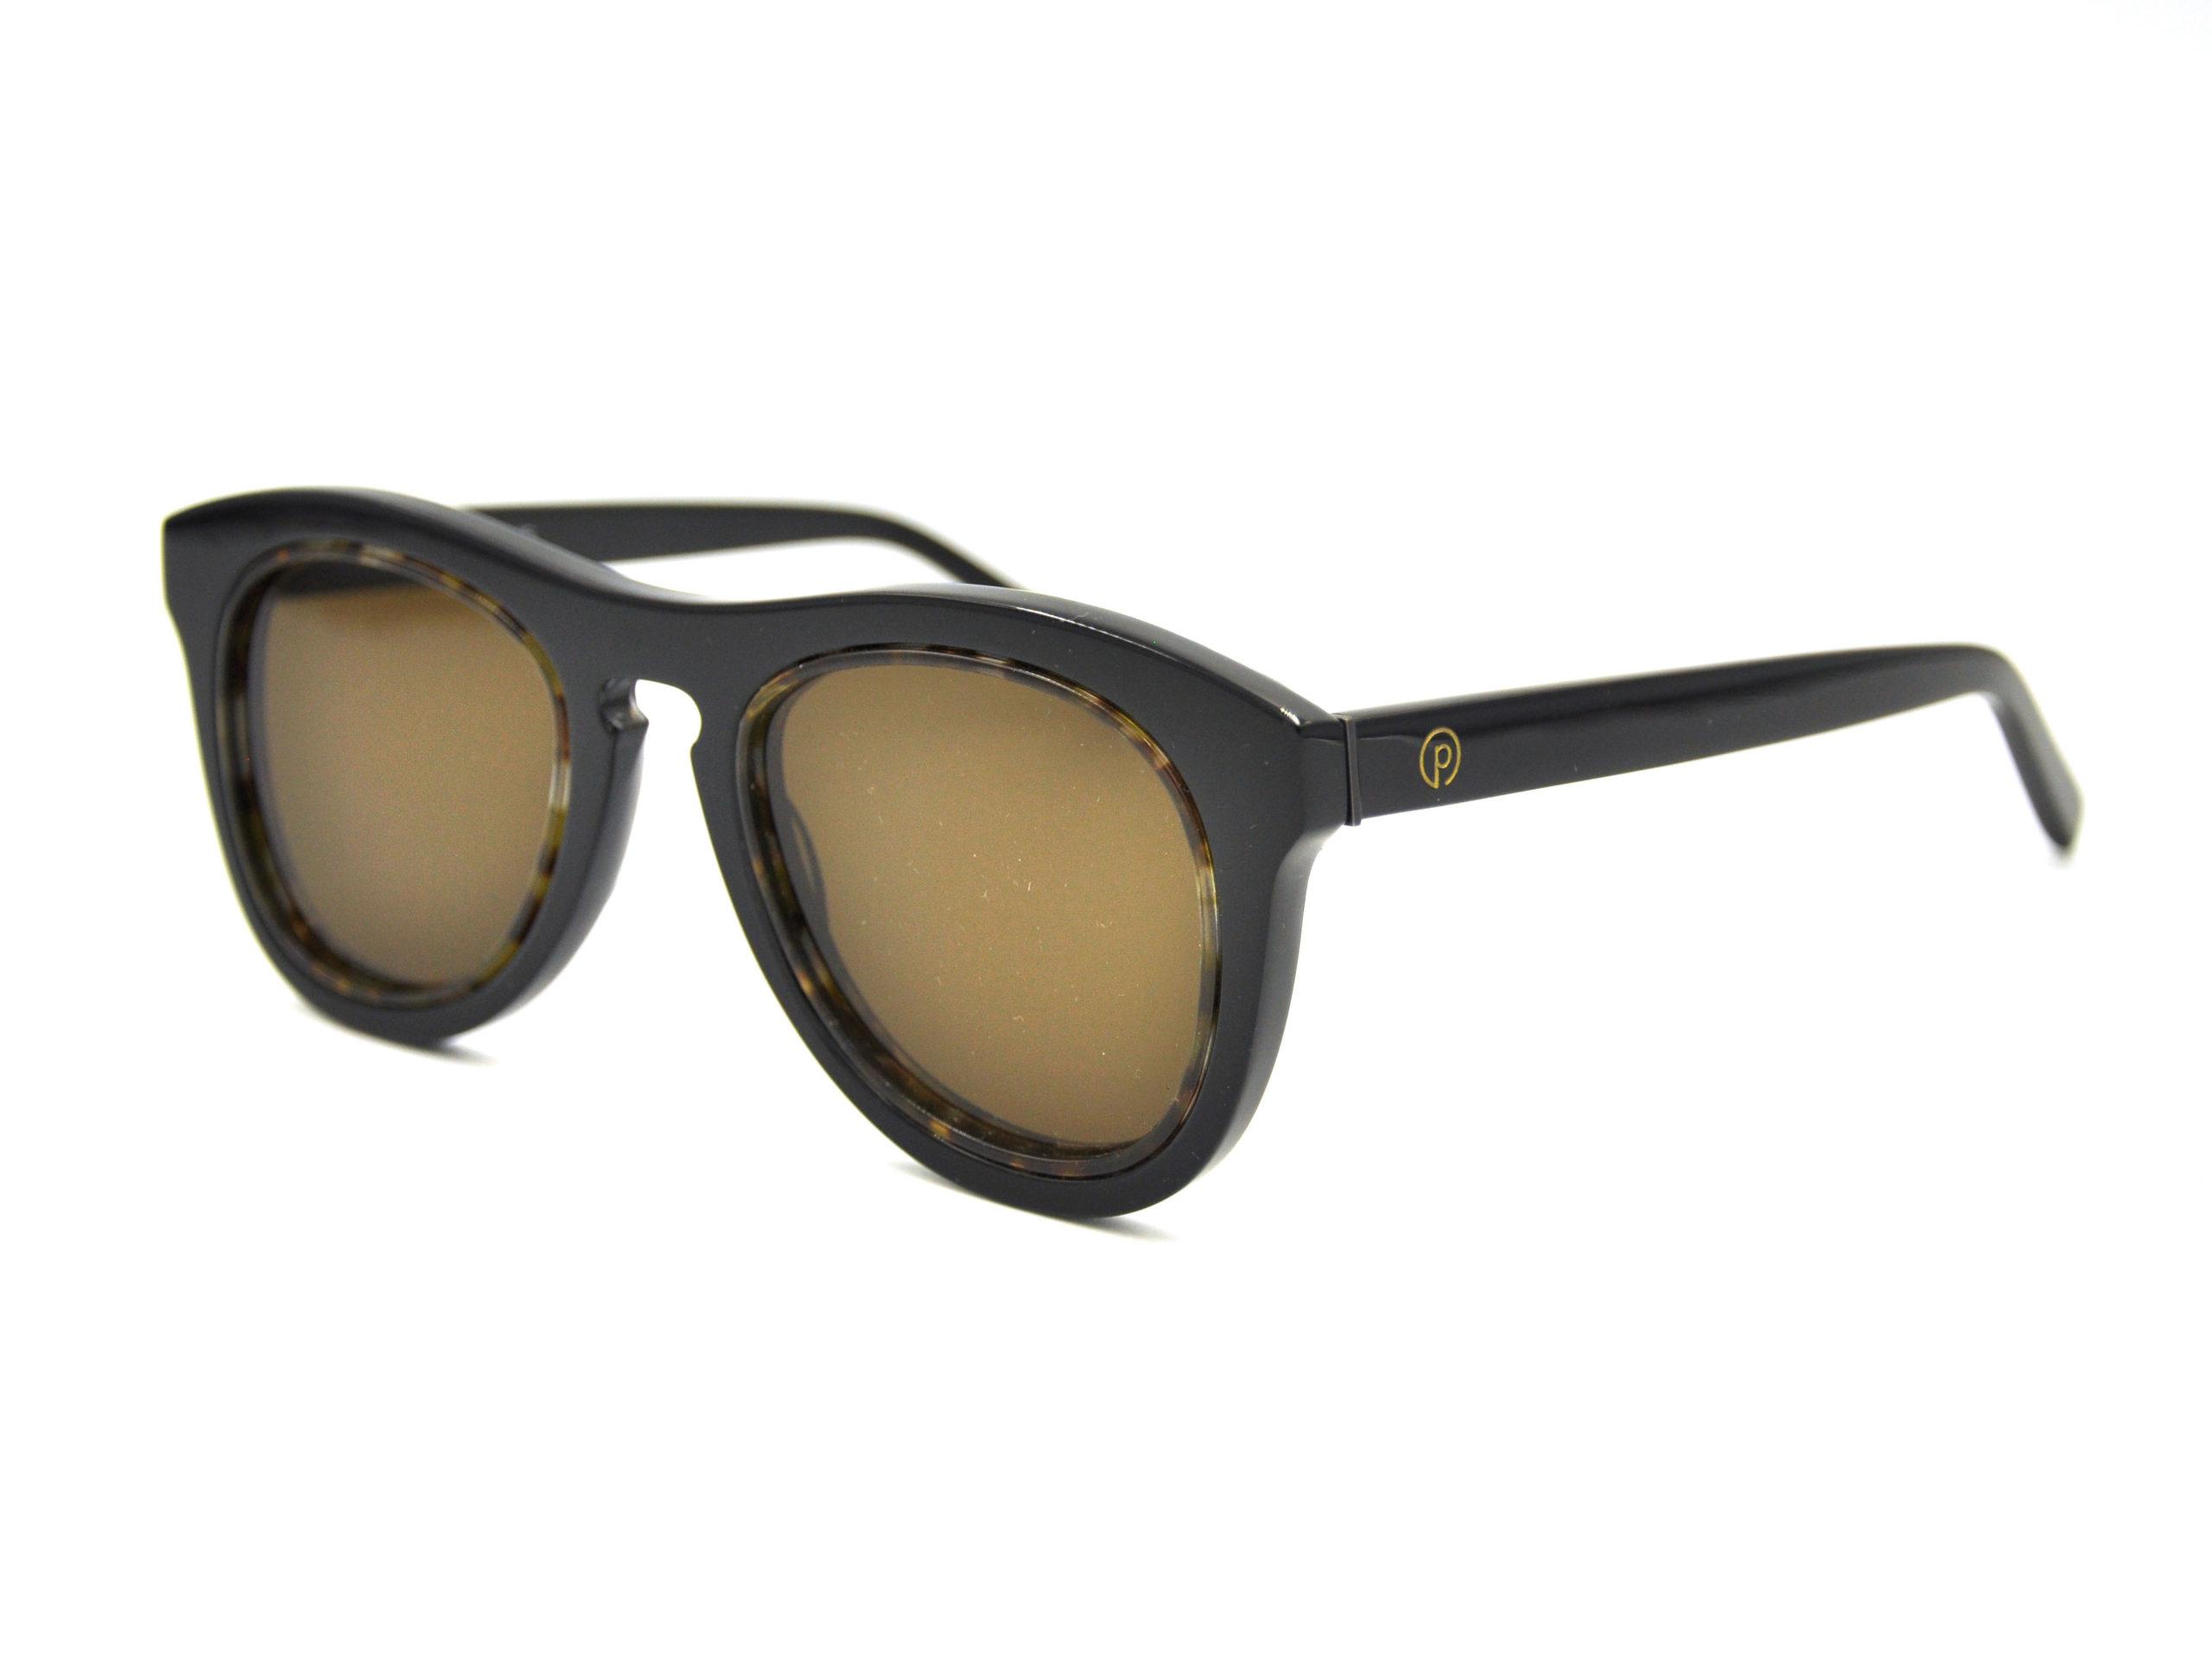 Porter & Reynard SIMONE C1 Unisex Sunglasses 2020